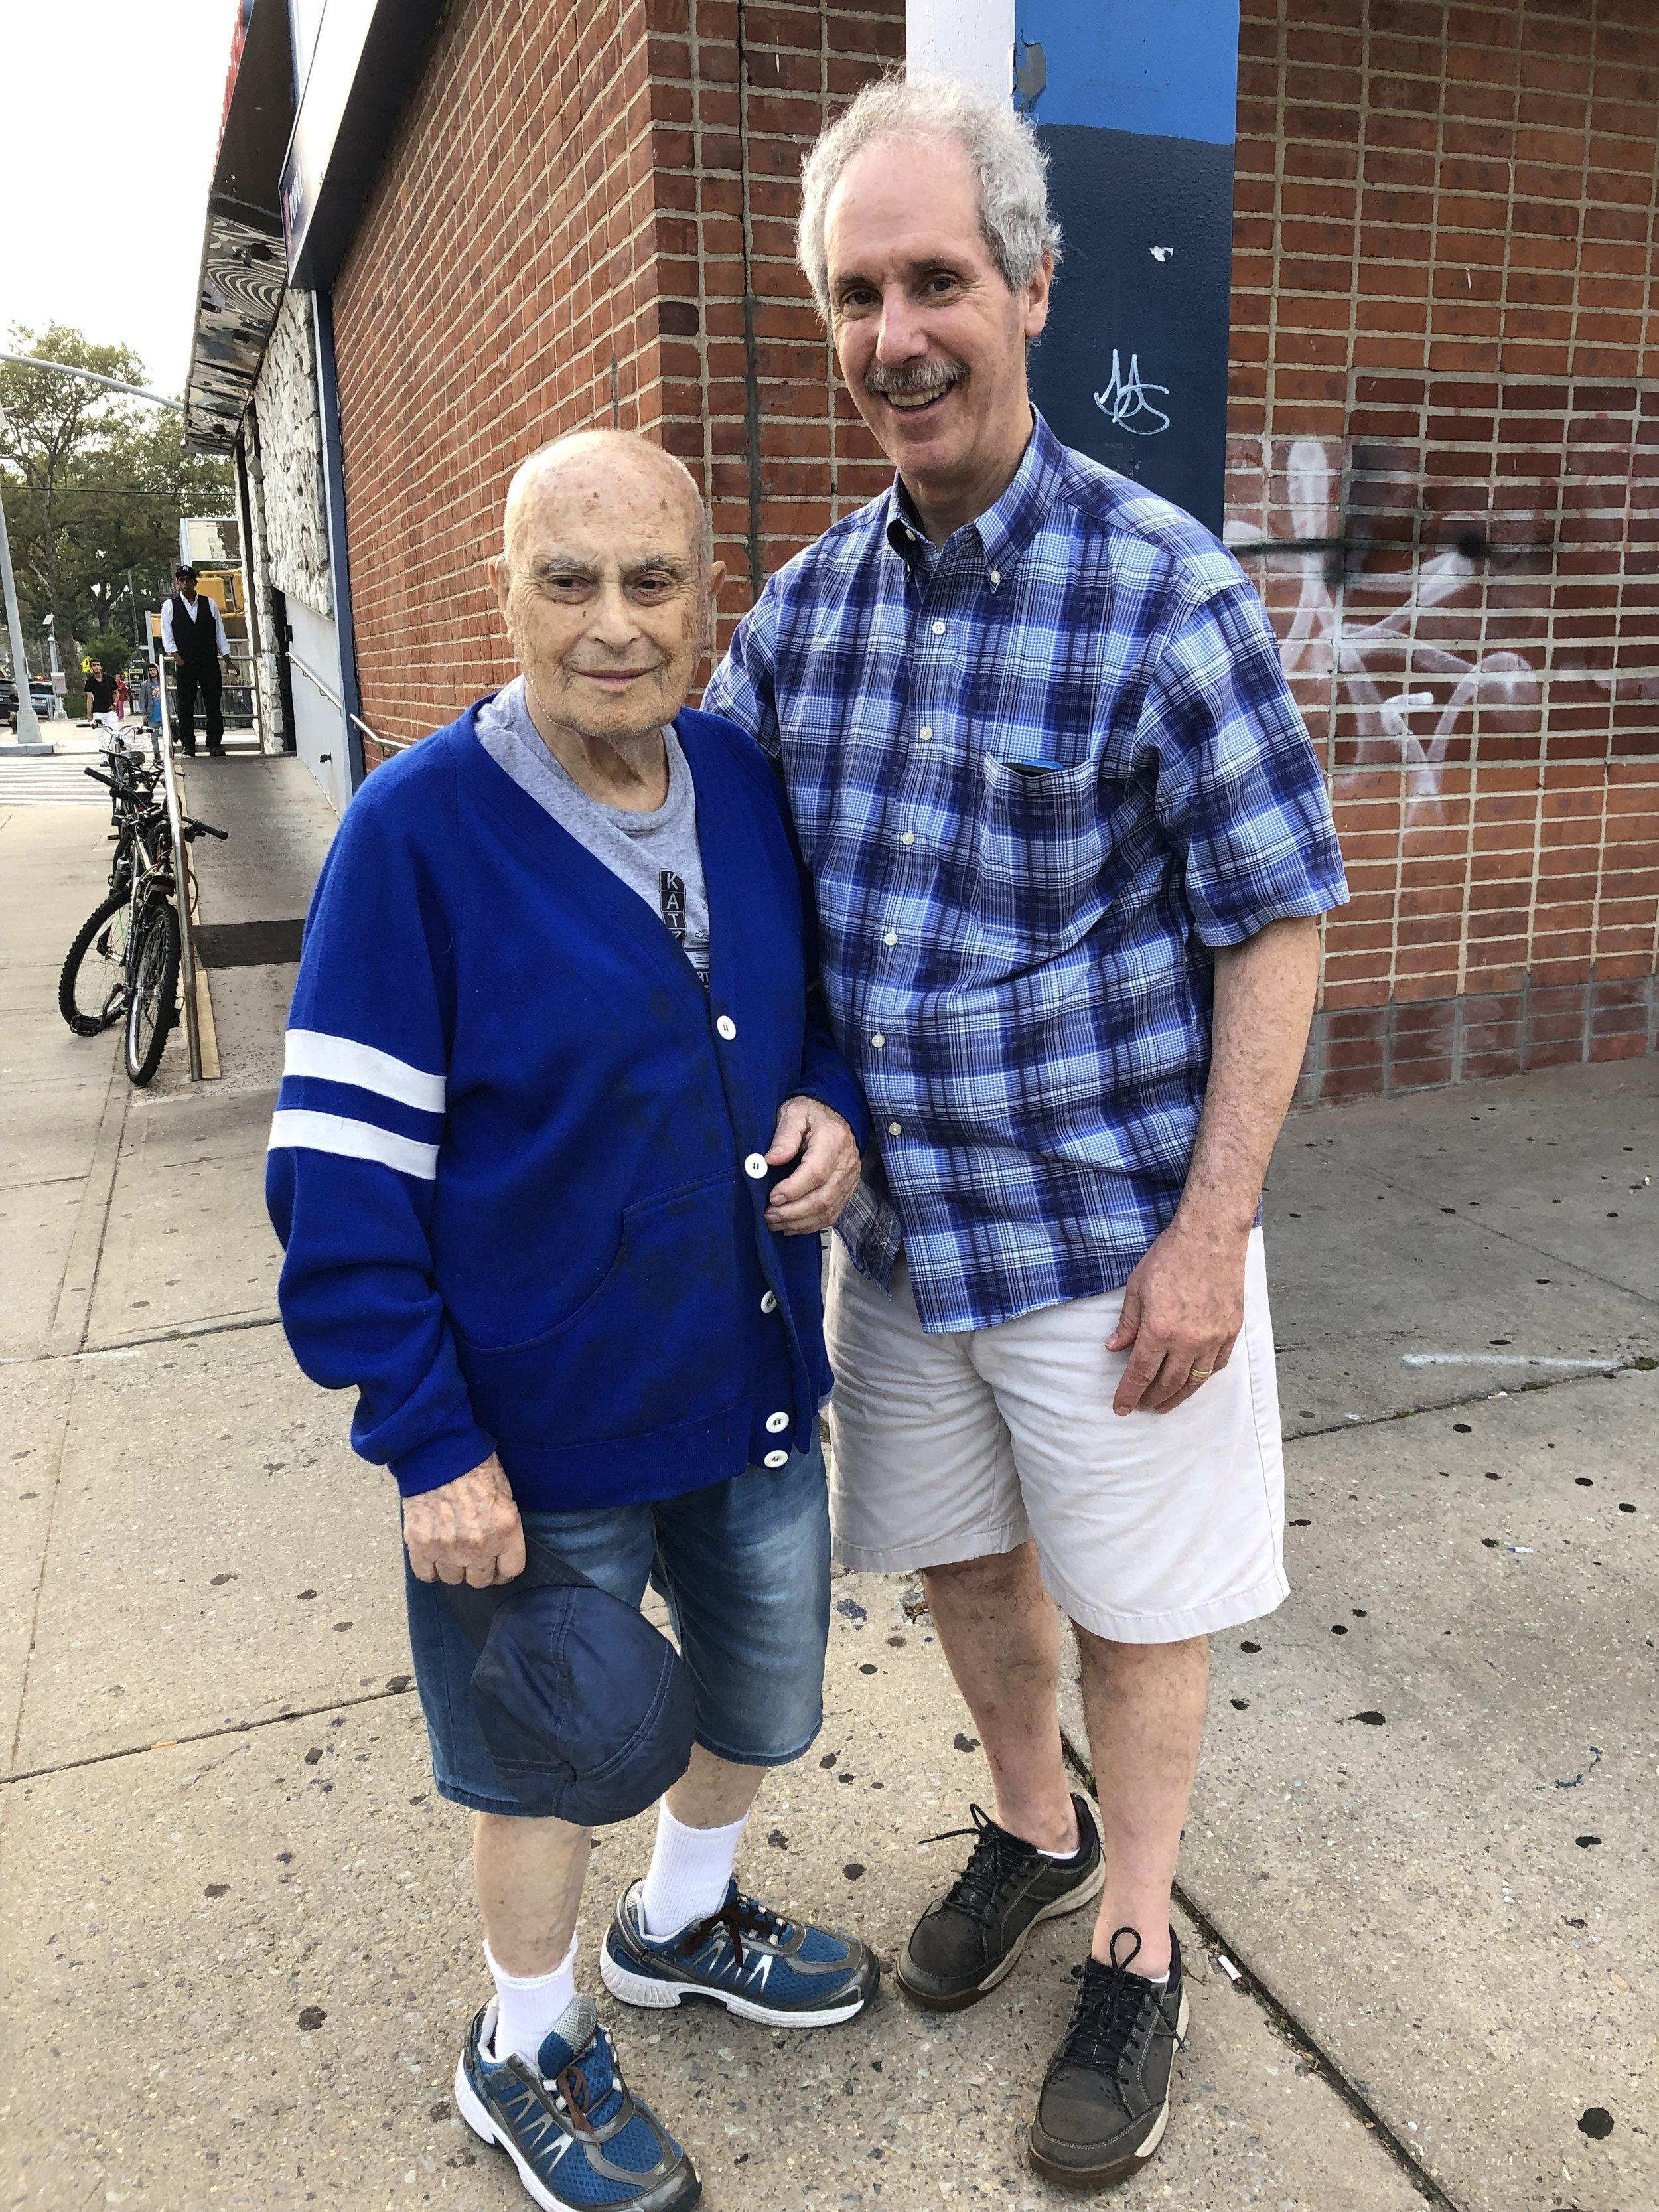 Lou Weber and Arnee Cohen Brooklyn, New York August 18, 2019